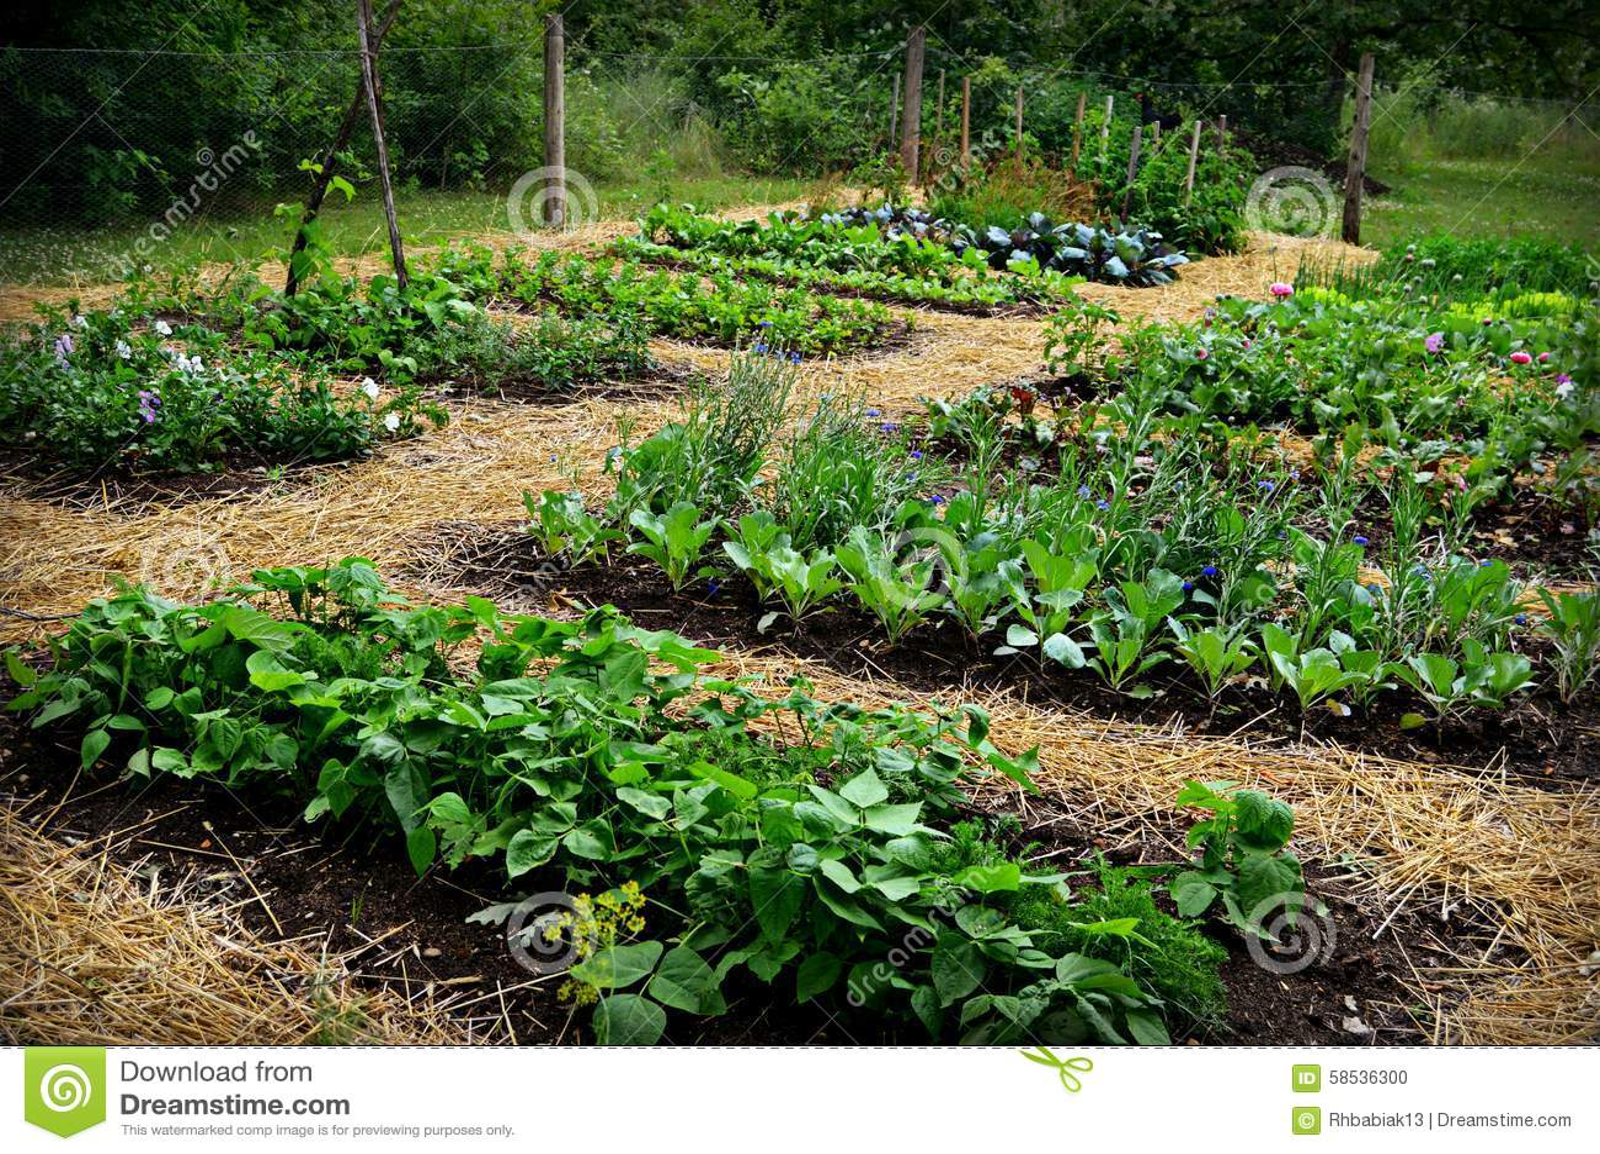 Vegetable Garden Stock Photo. Vegetable Garden Stock Photo   Image  44006565